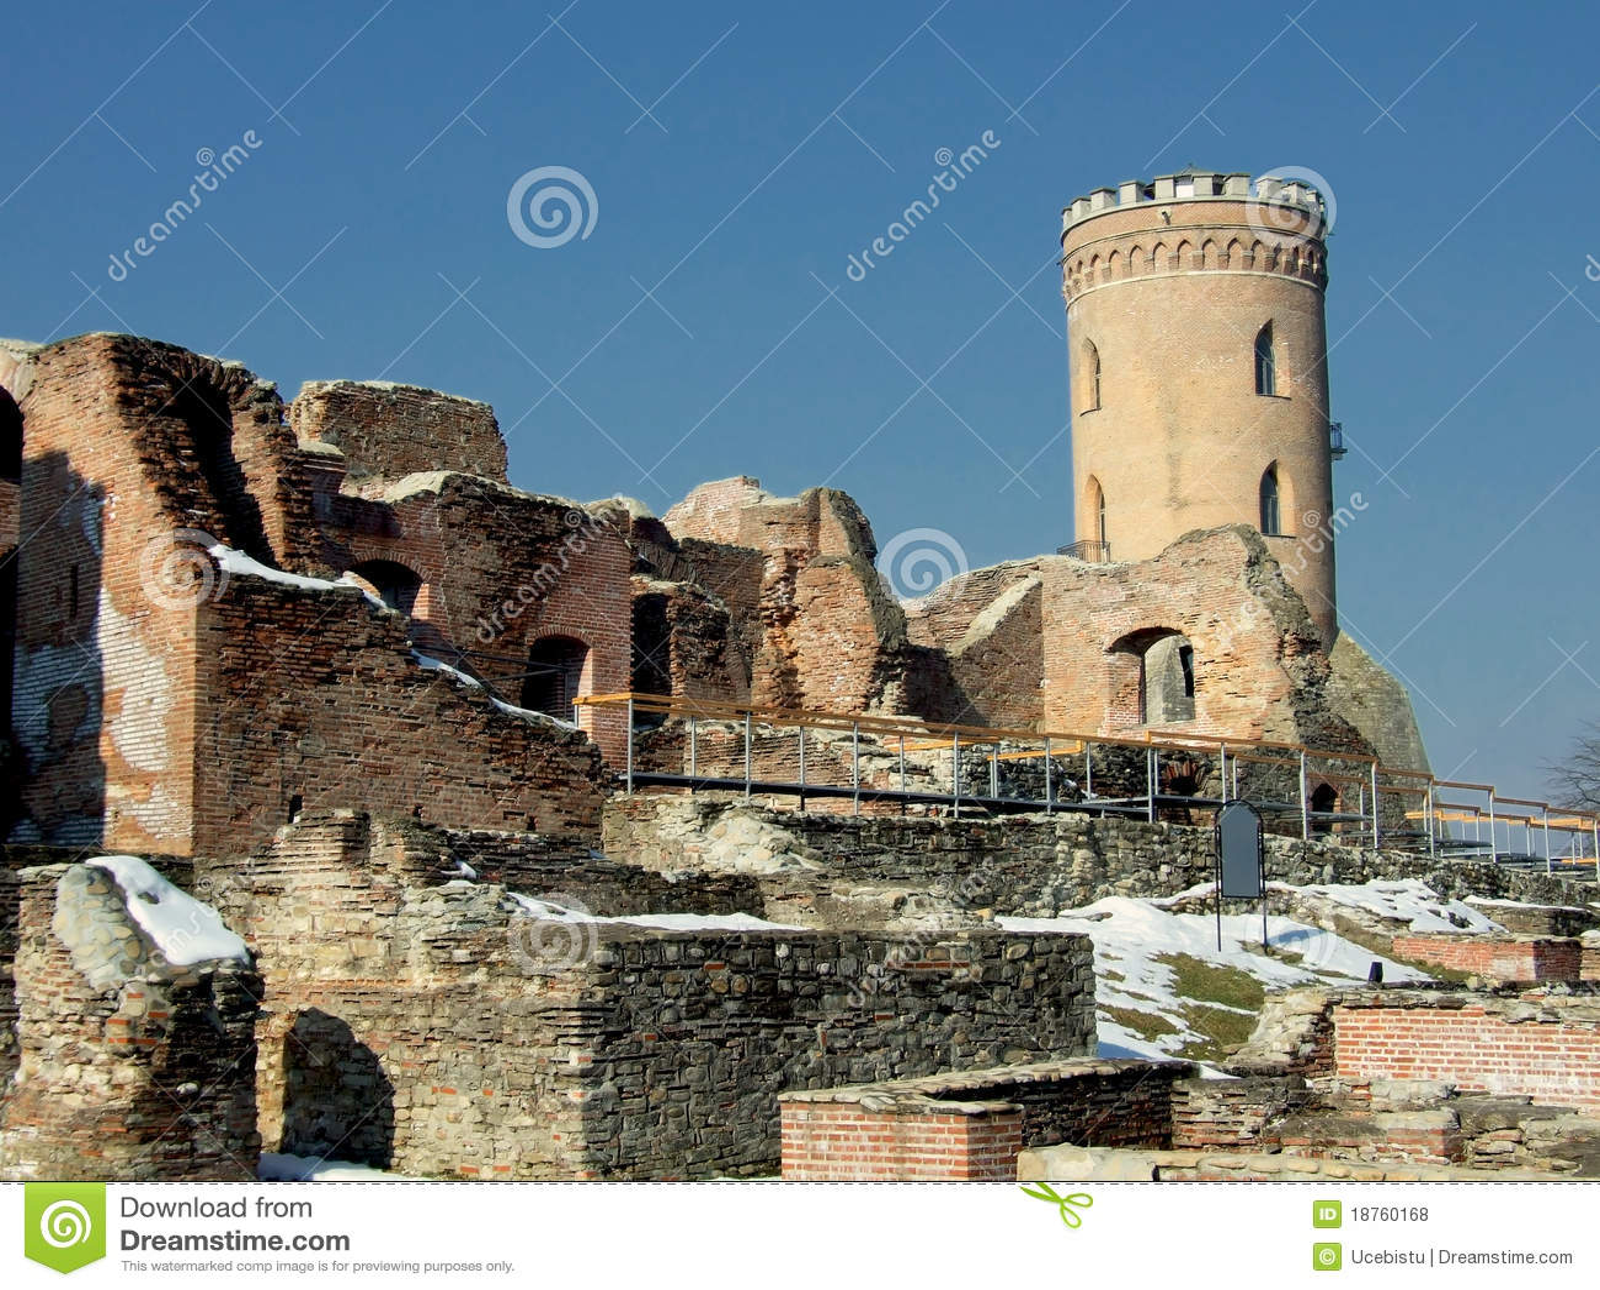 Chindia Tower (Turnul Chindiei) Stock Image - Image of ...  |Chindia